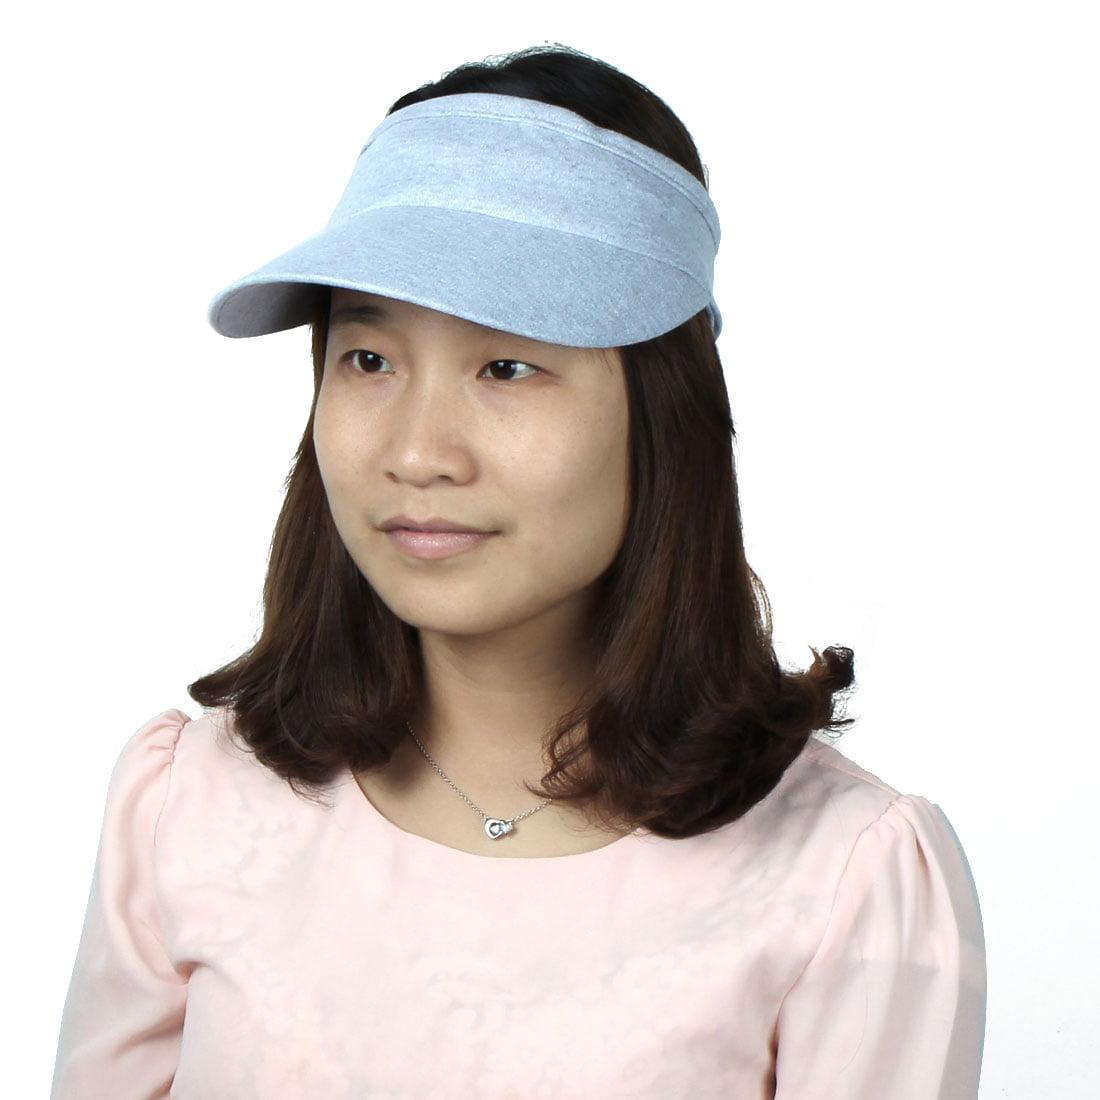 Ladies Summer Outdoor Running Golf Tennis Sports Casual Sun Visor Cap Light Gray